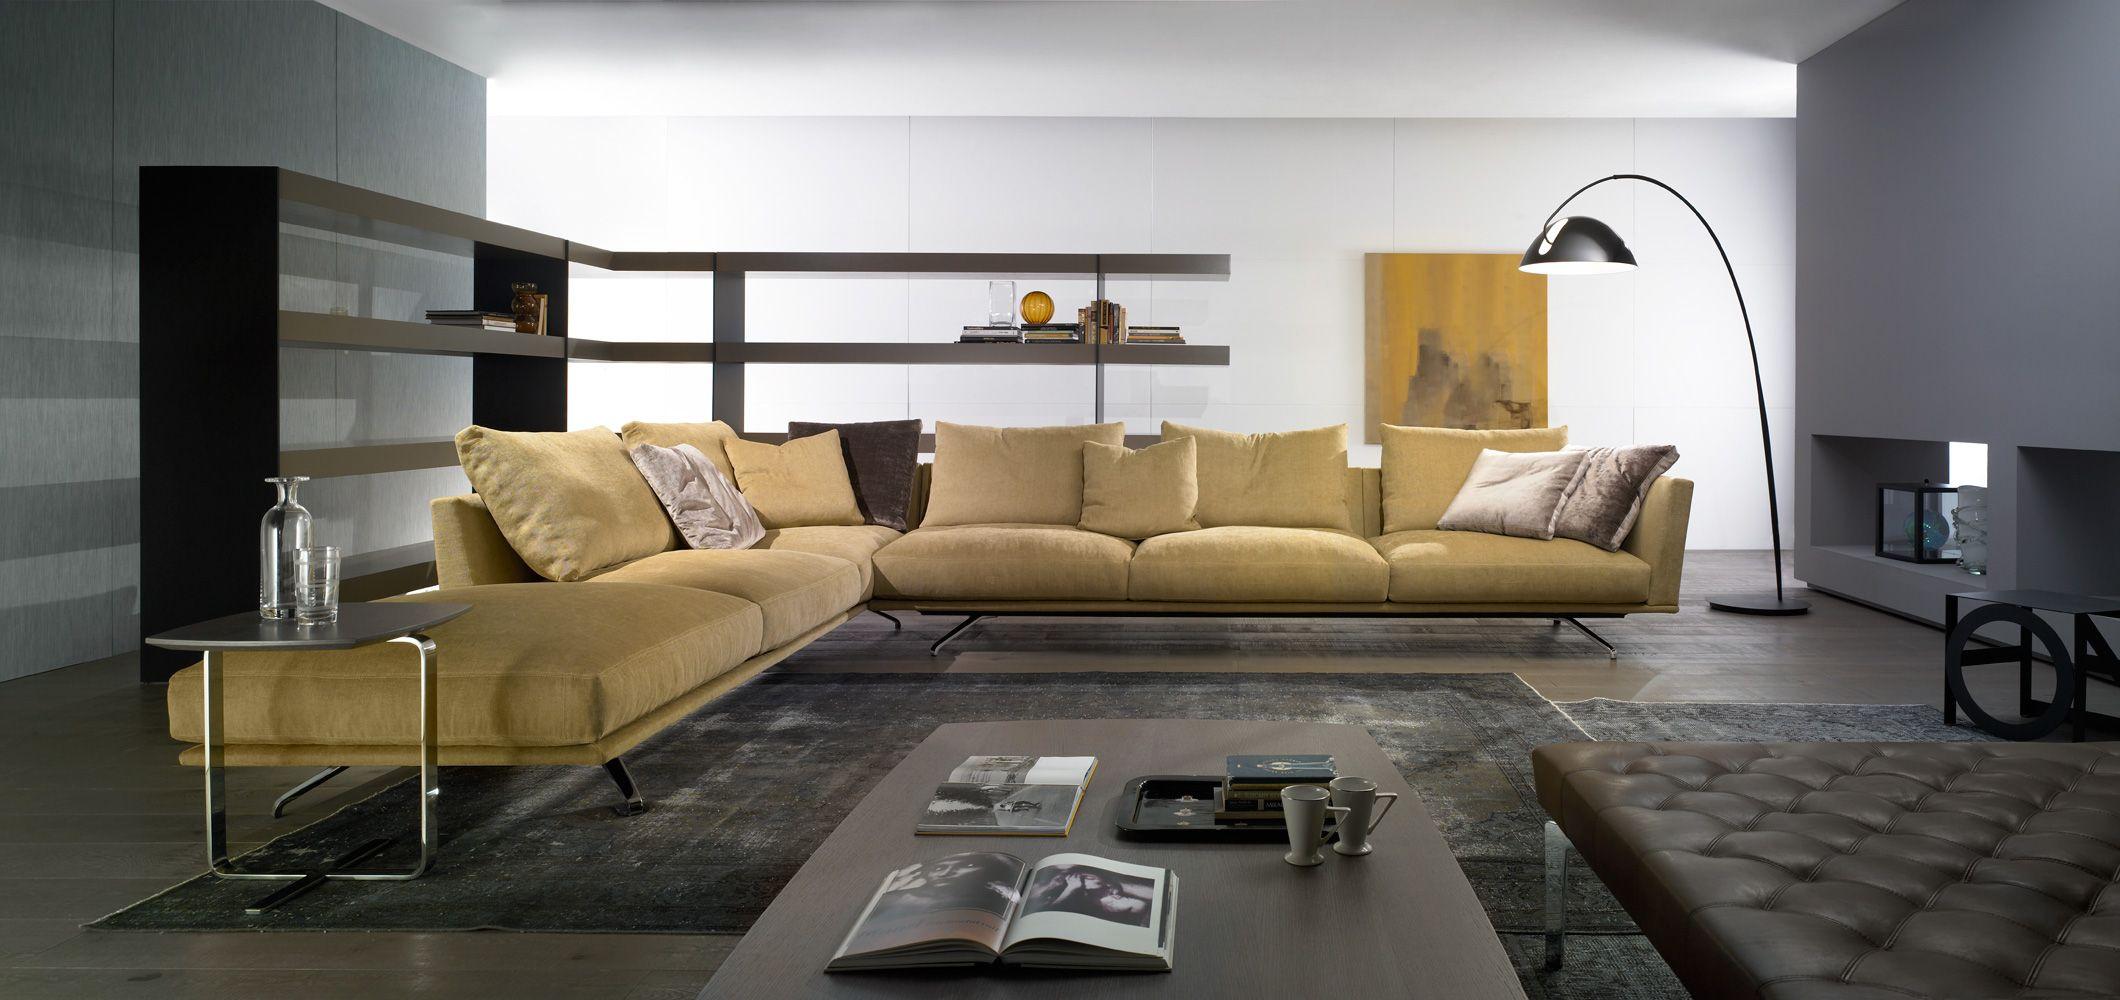 Delightful Furniture · CasaDesús   Furniture Design Barcelona   Shelby Collection